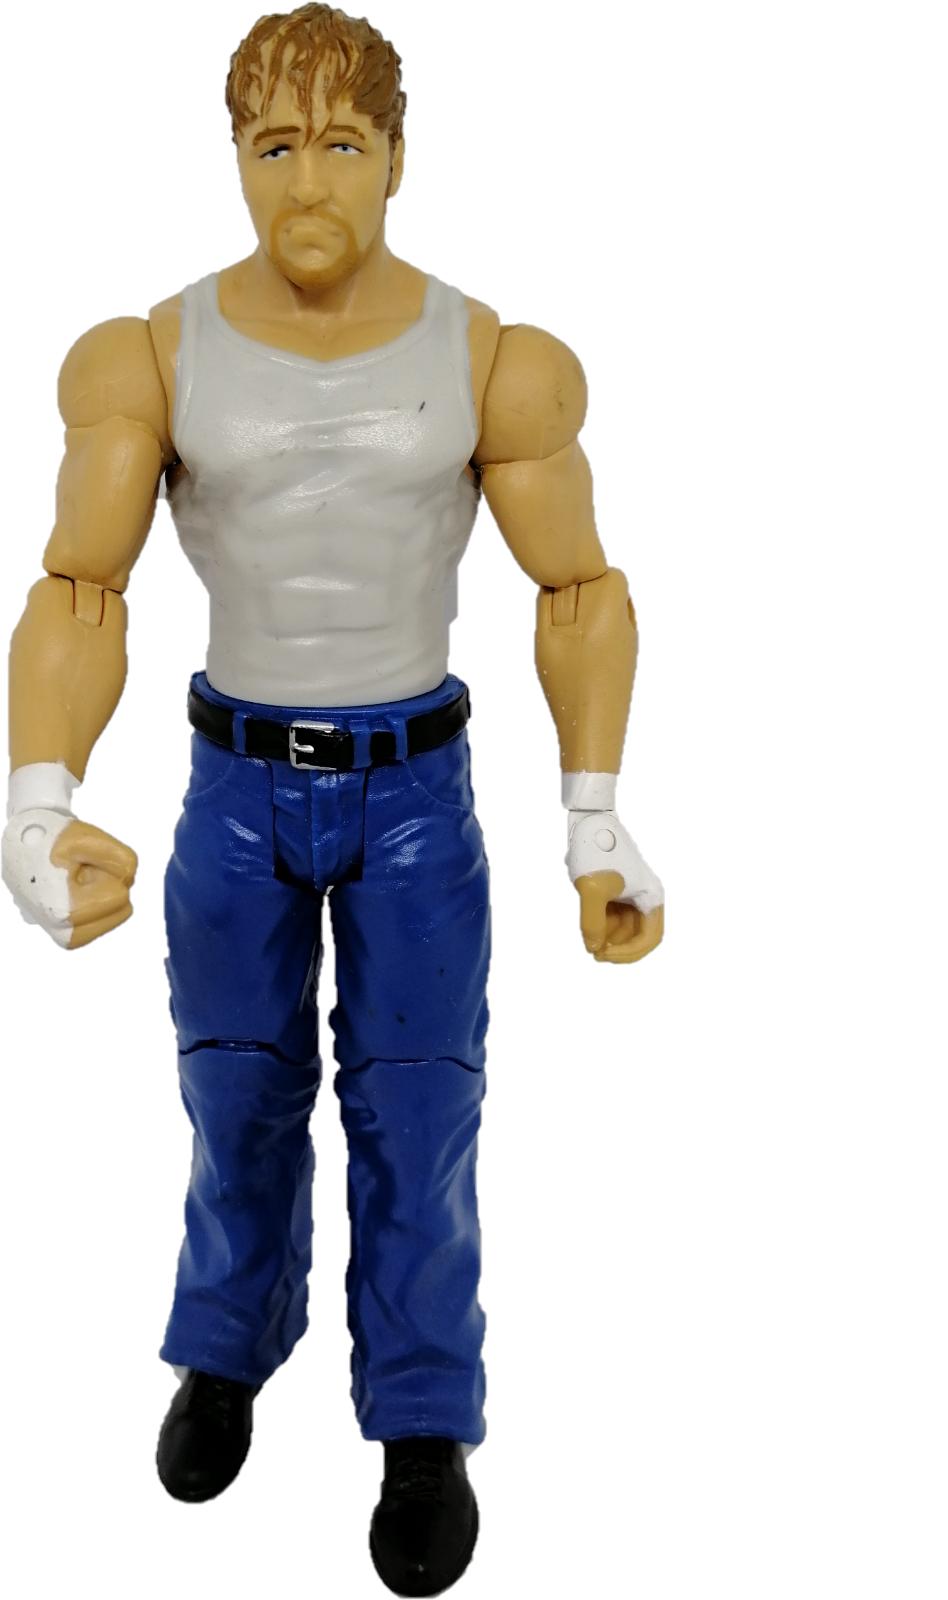 Dean Ambrose WWE Wrestling Action Figure Mattel Signature Series 6 Jon Moxley